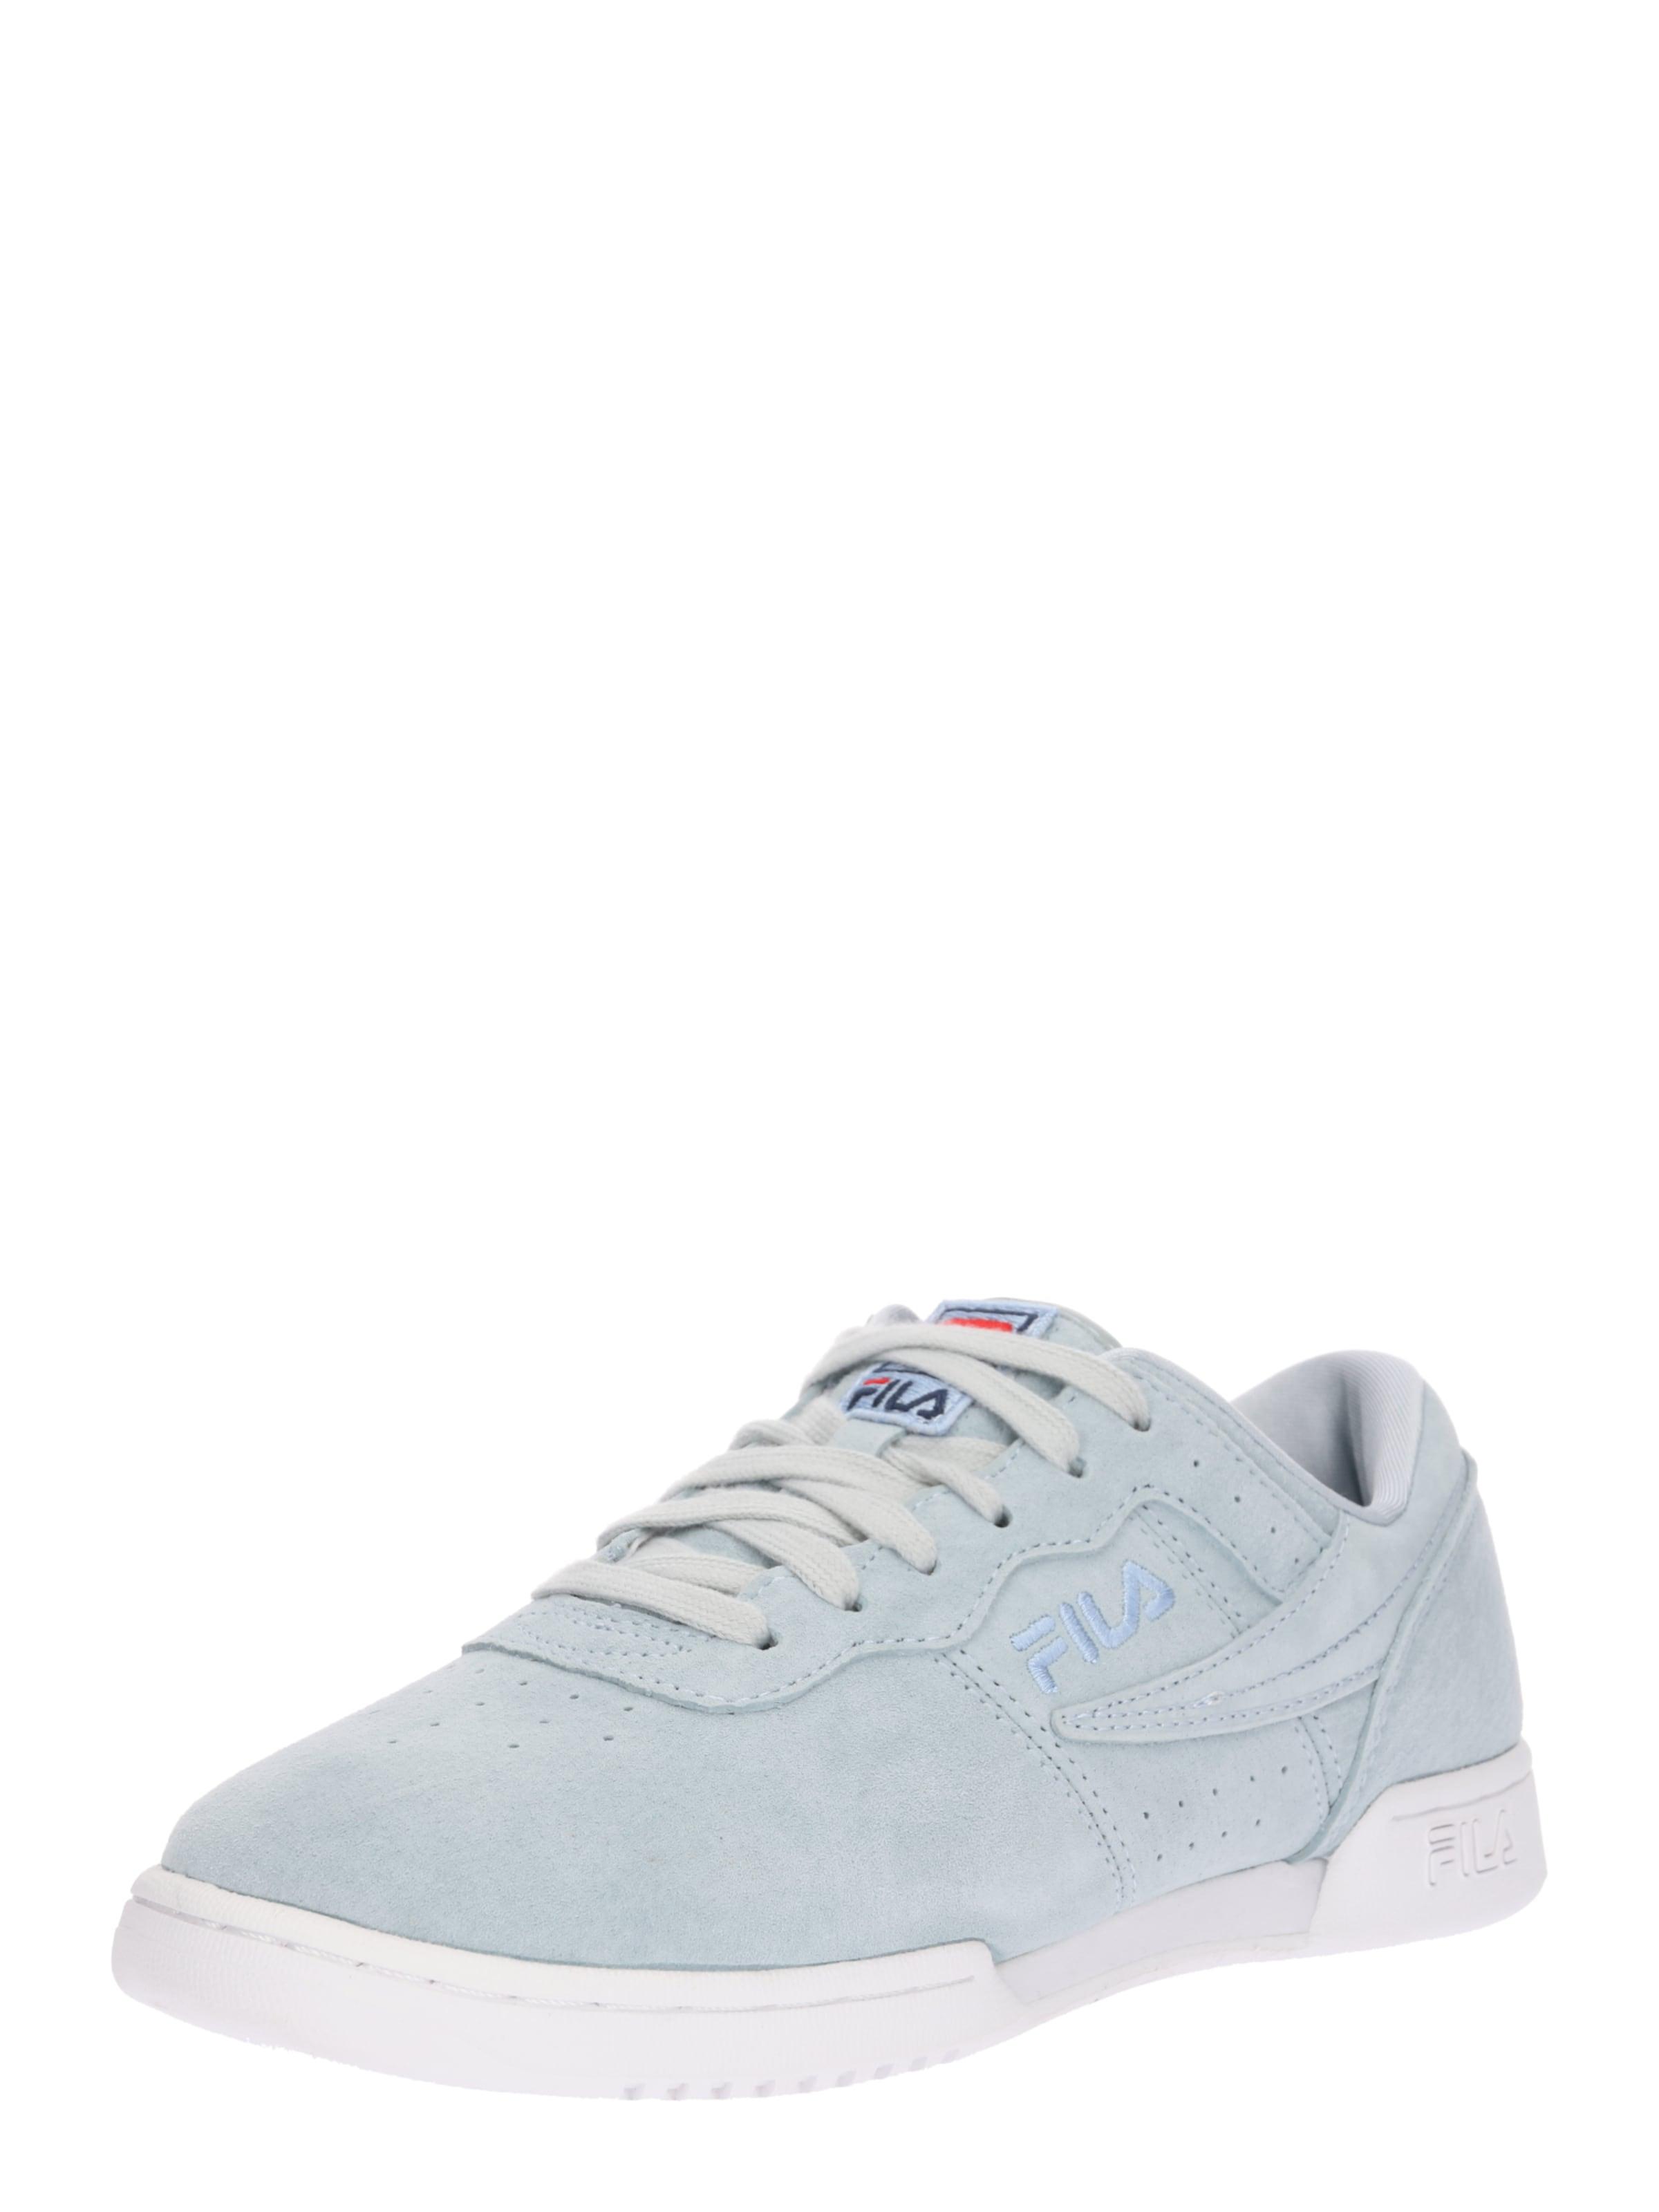 FILA Sneaker Original Fitness Verschleißfeste billige Schuhe